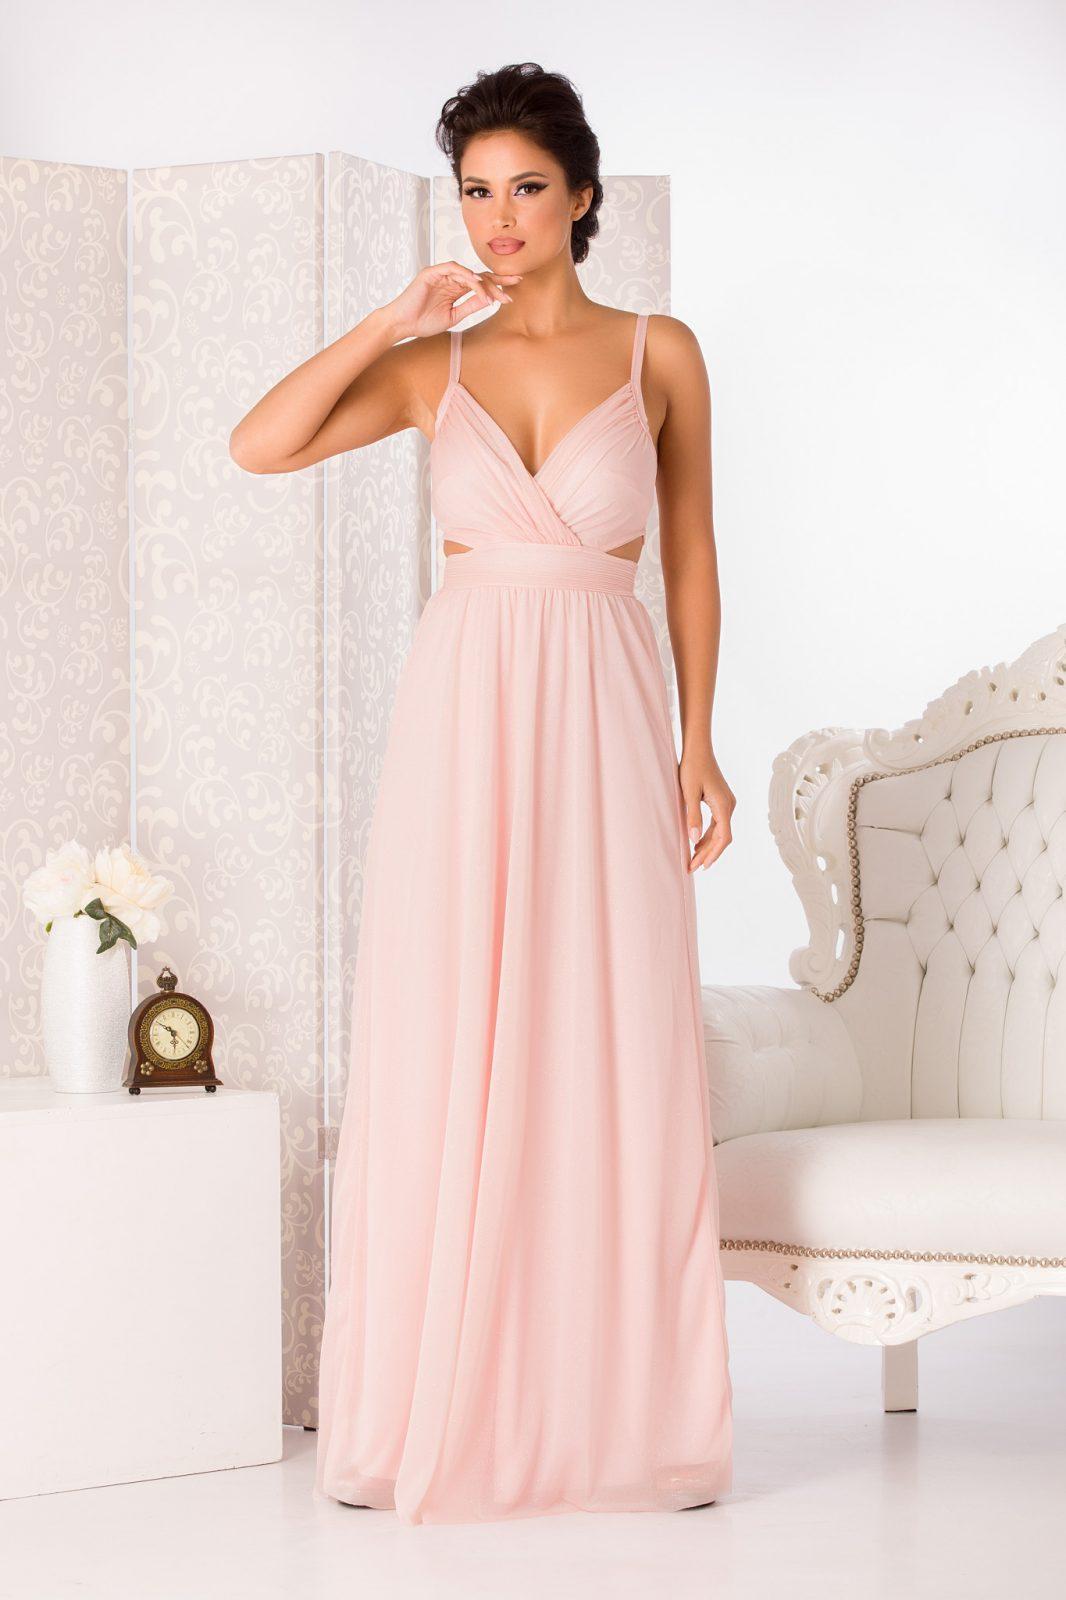 Amaryllis Maxi Ροζ Φόρεμα 4998